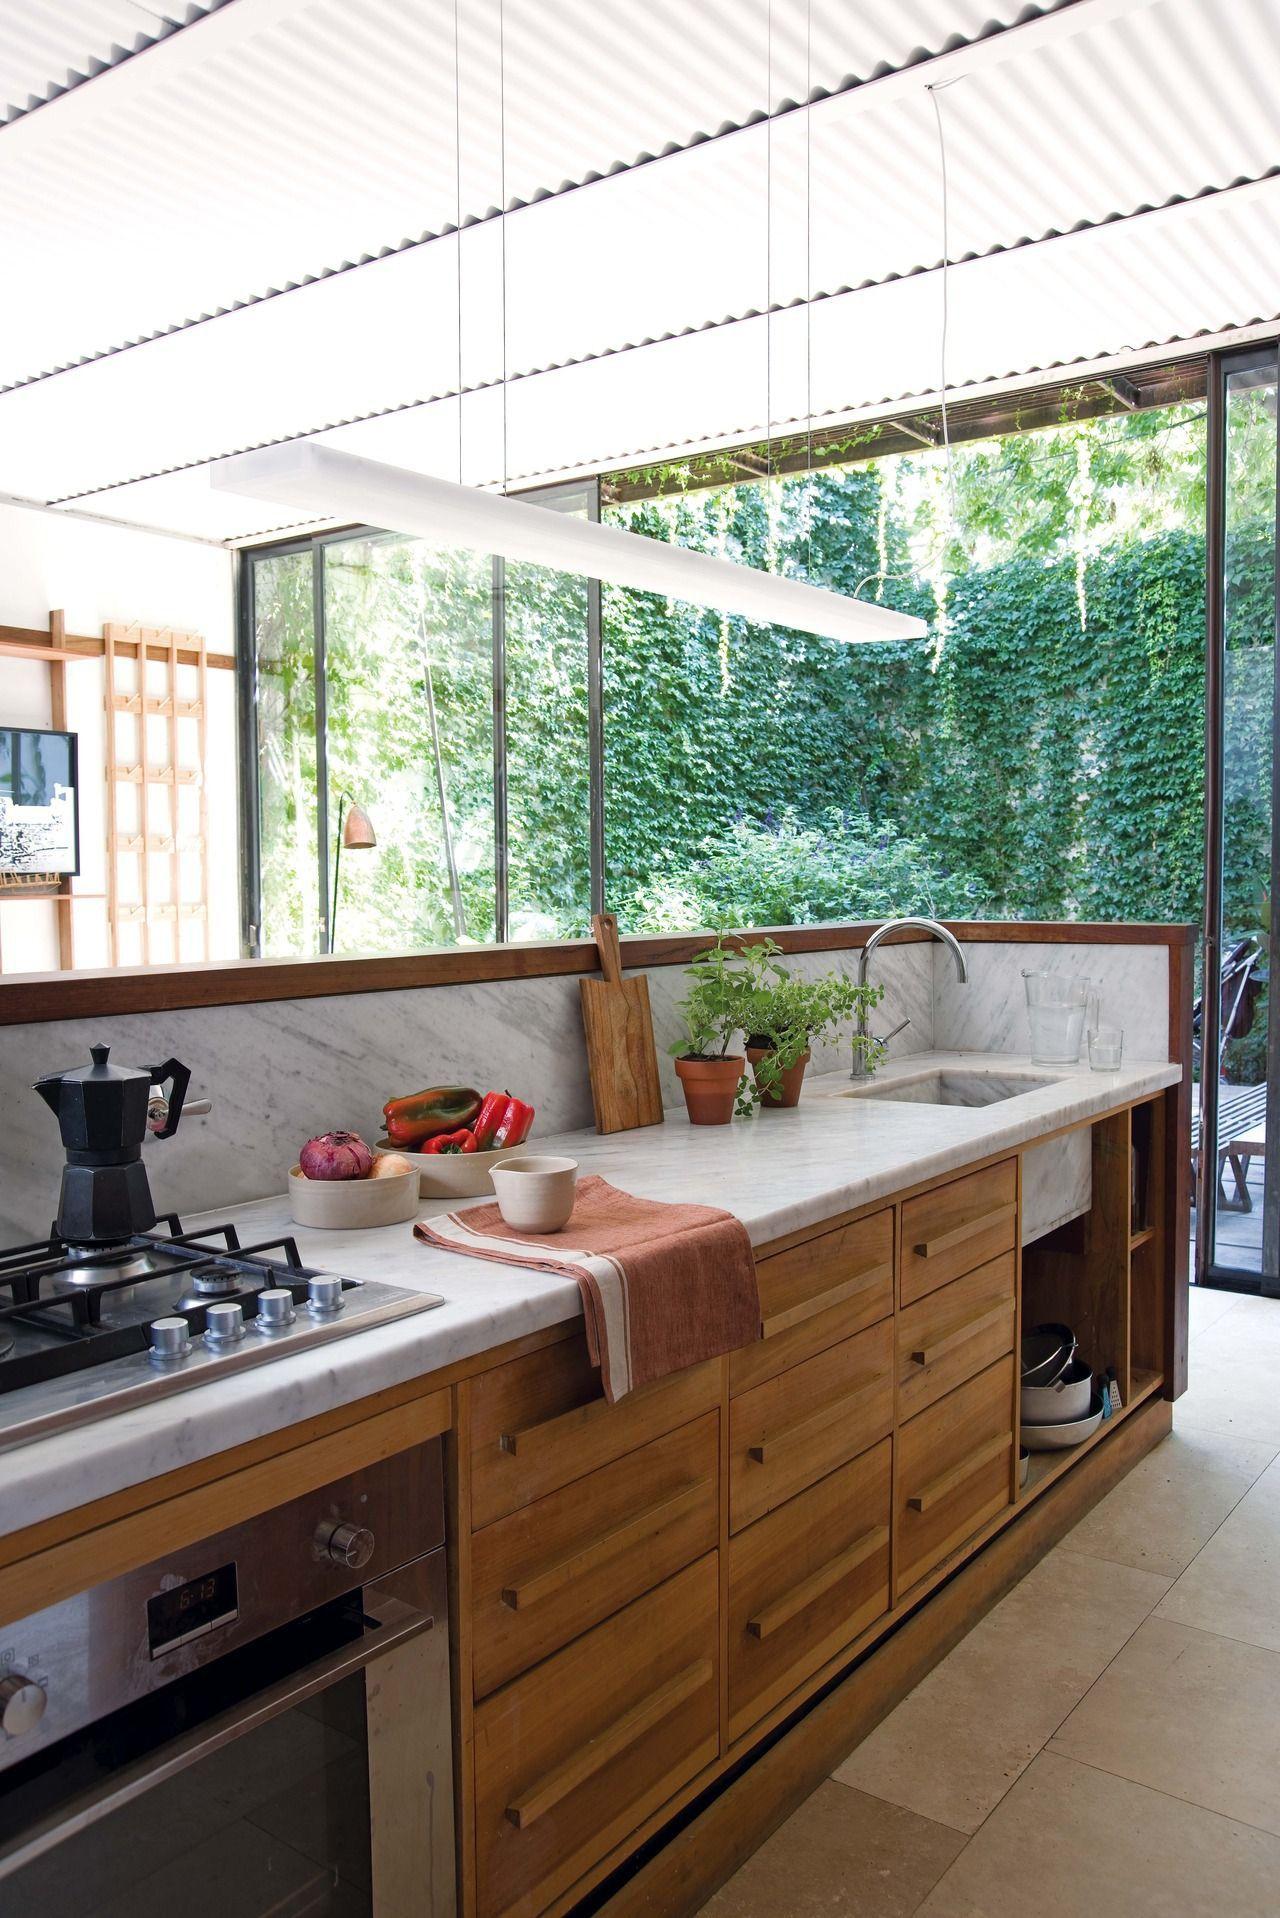 Clara House In Buenos Aires Argentina By Tovo Sarmiento Arquitectos Yellowtrace Kitchen Inspiration Design Interior Design Kitchen French Kitchen Decor